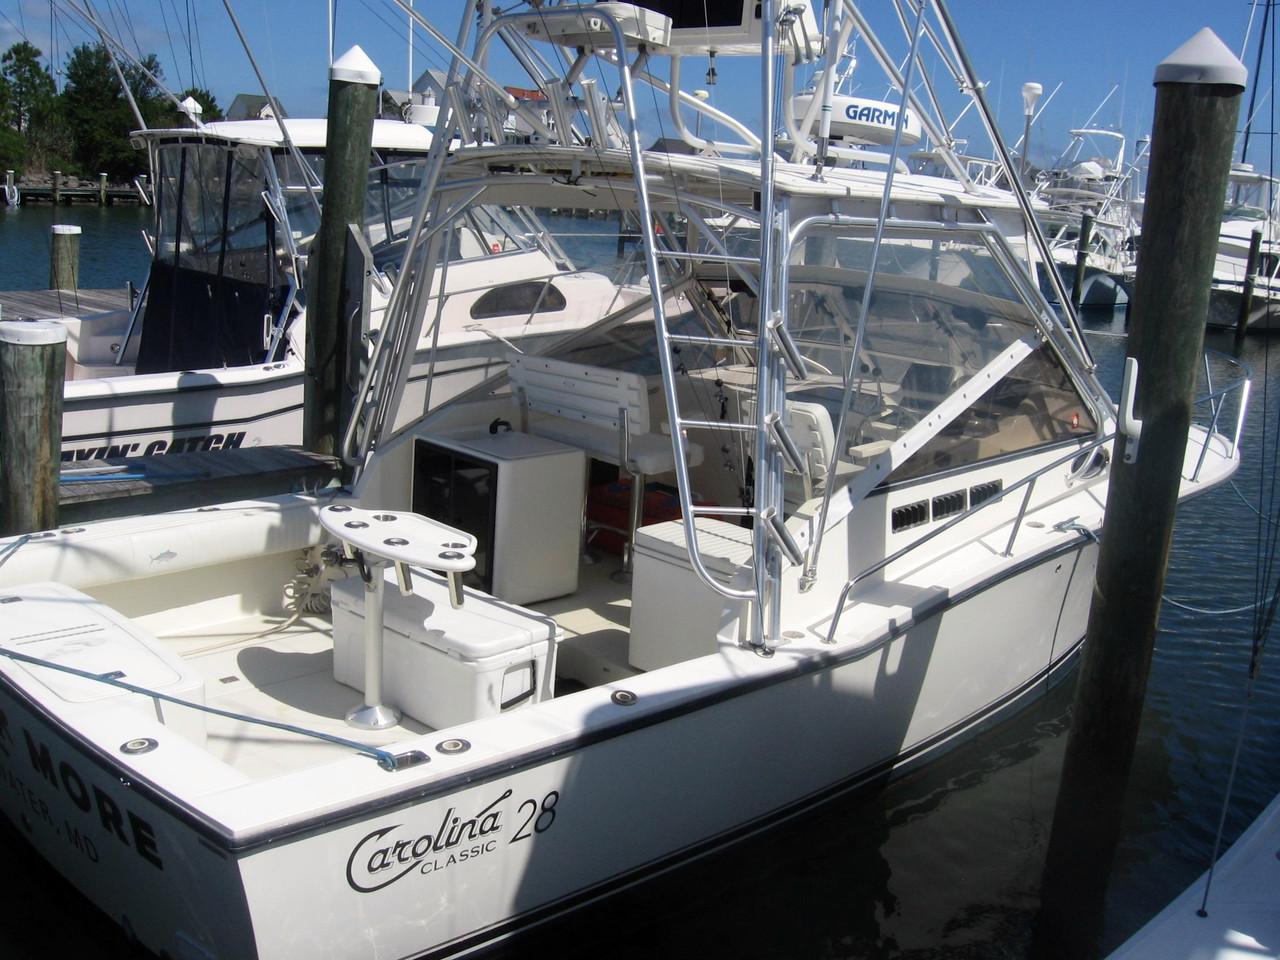 2003 used carolina classic 28 sports fishing boat for sale for Used fishing boats for sale in md